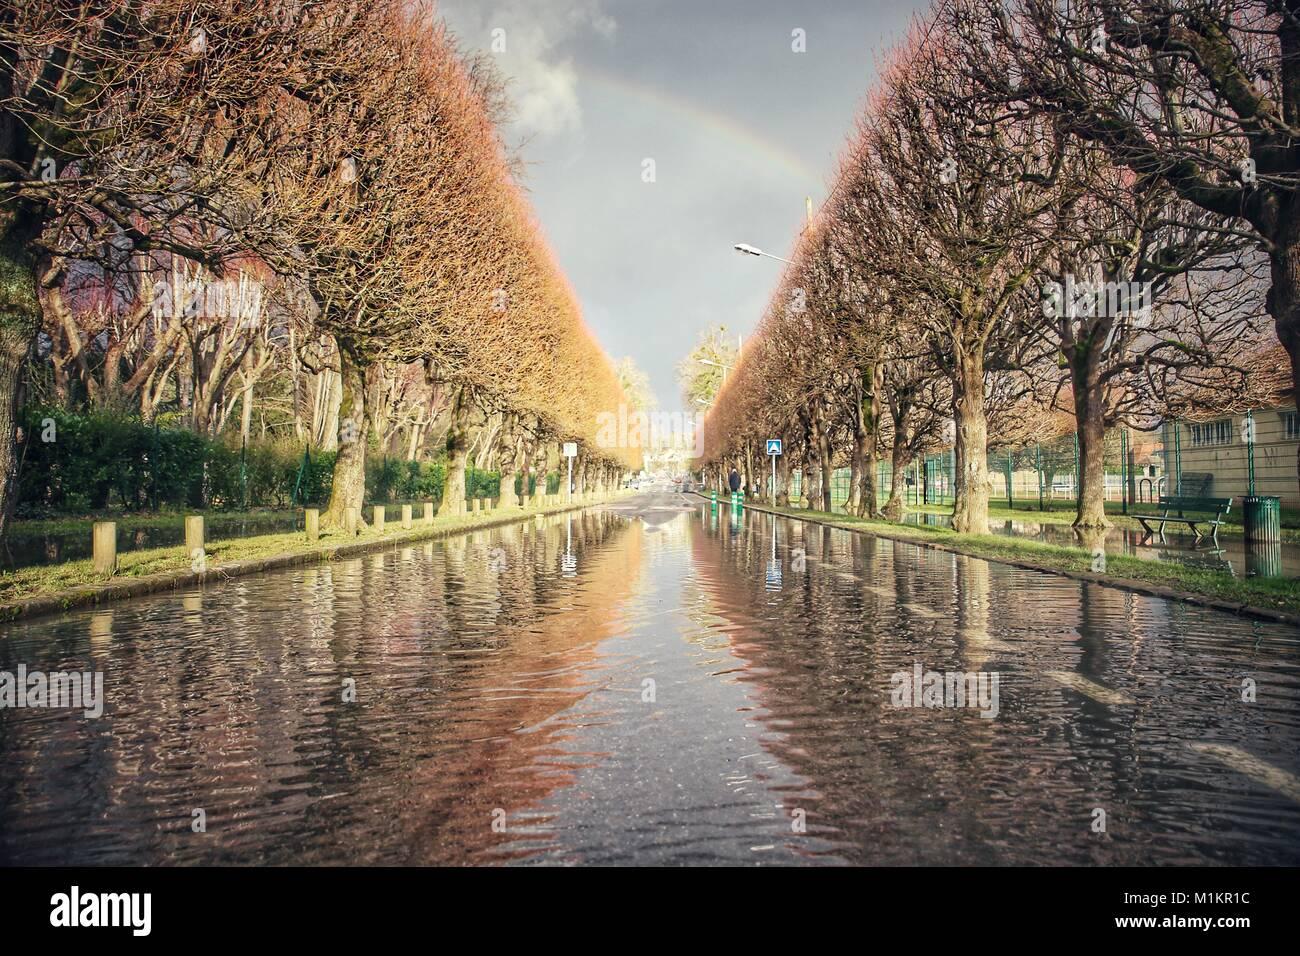 Sandrine Huet / Le Pictorium -  The Seine river flood, January 2018 -  26/01/2018  -  France / Ile-de-France (region) - Stock Image